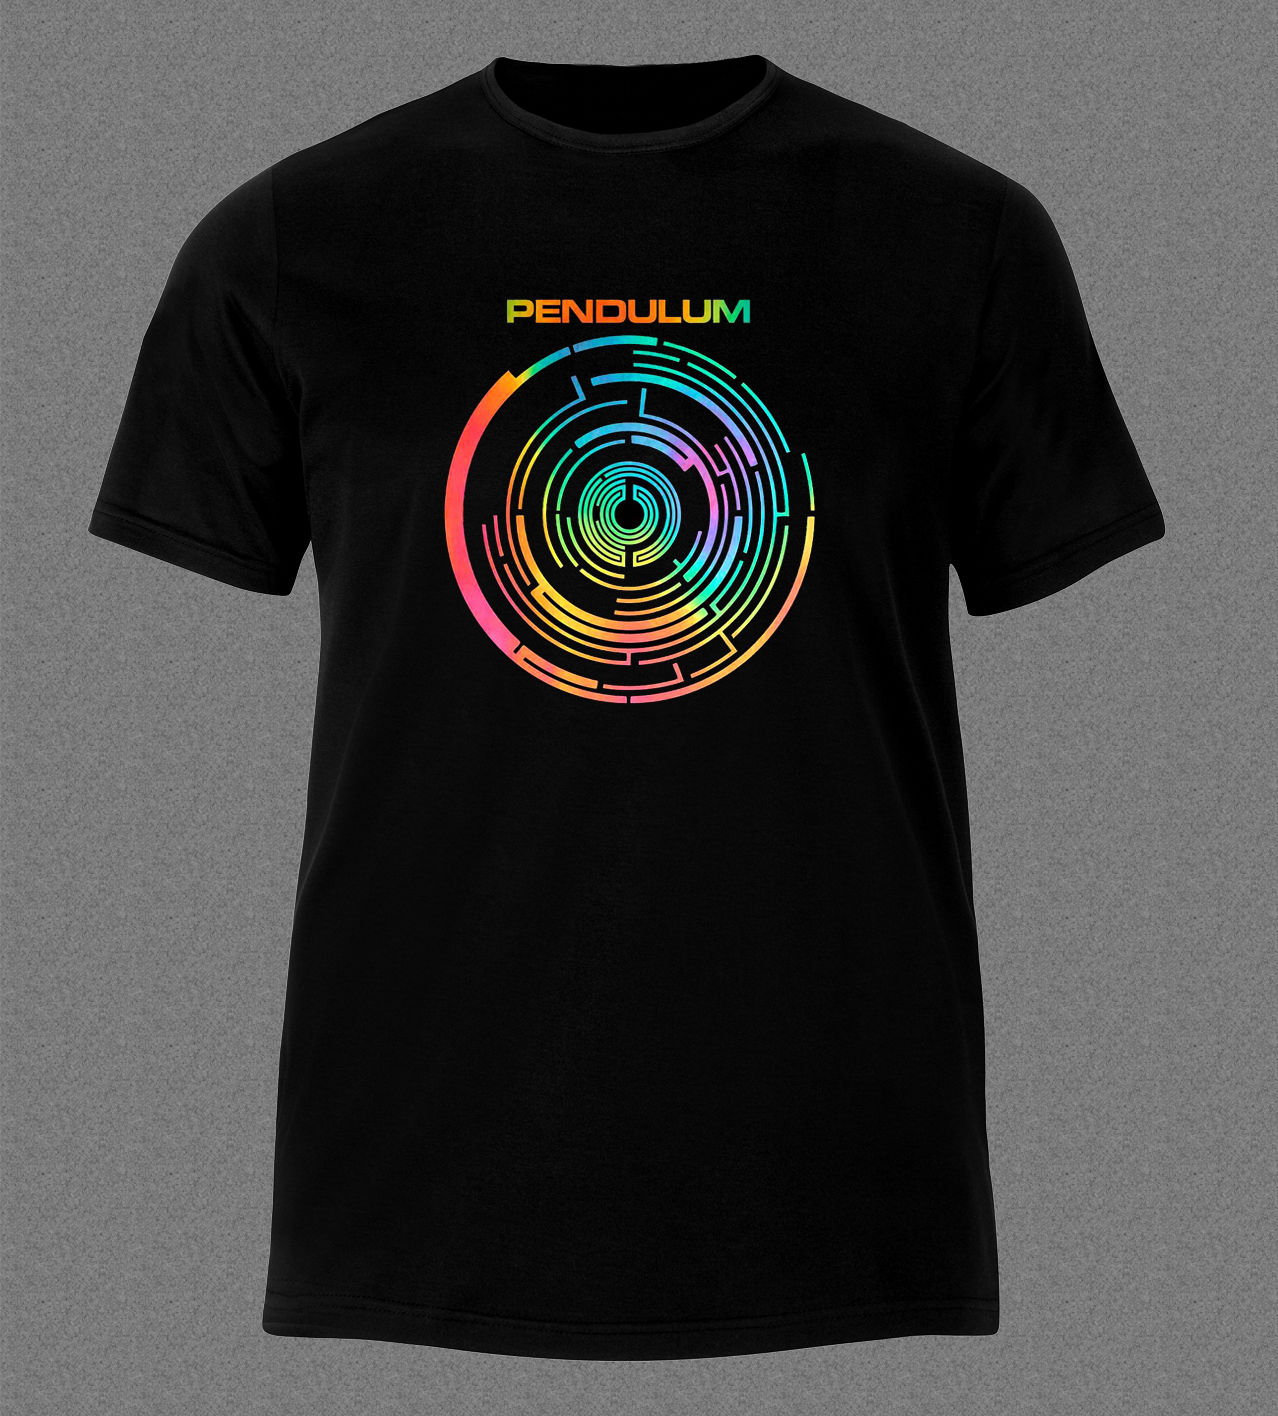 Design t shirt online australia - Pendulum Drum And Bass Electronic Rock Music Australia T Shirt Brand Cotton Men Clothing Male